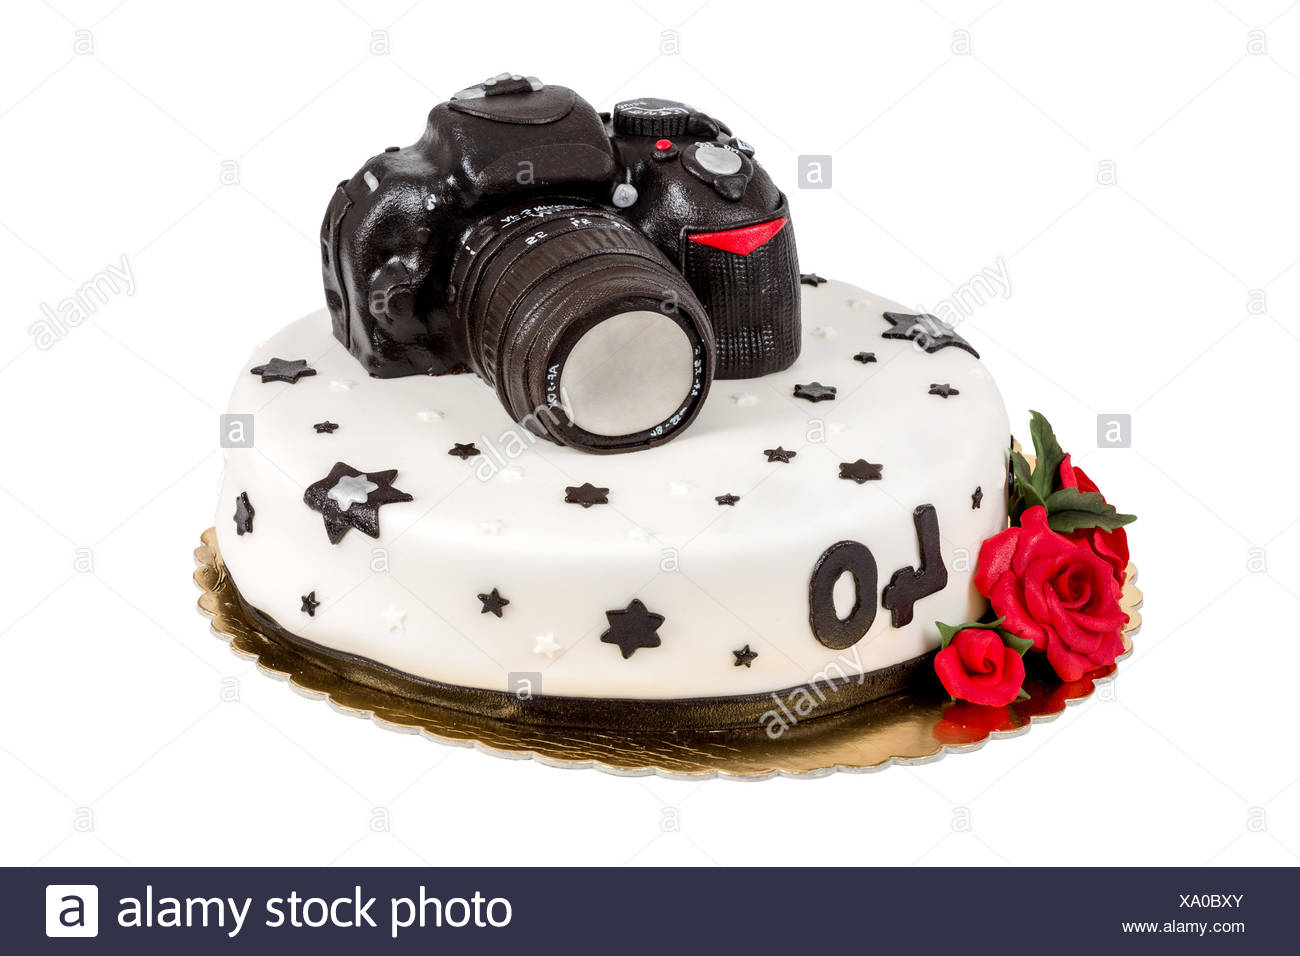 Pleasant Birthday Cake For Forty Anniversary With Modern Dslr Photo Camera Funny Birthday Cards Online Benoljebrpdamsfinfo